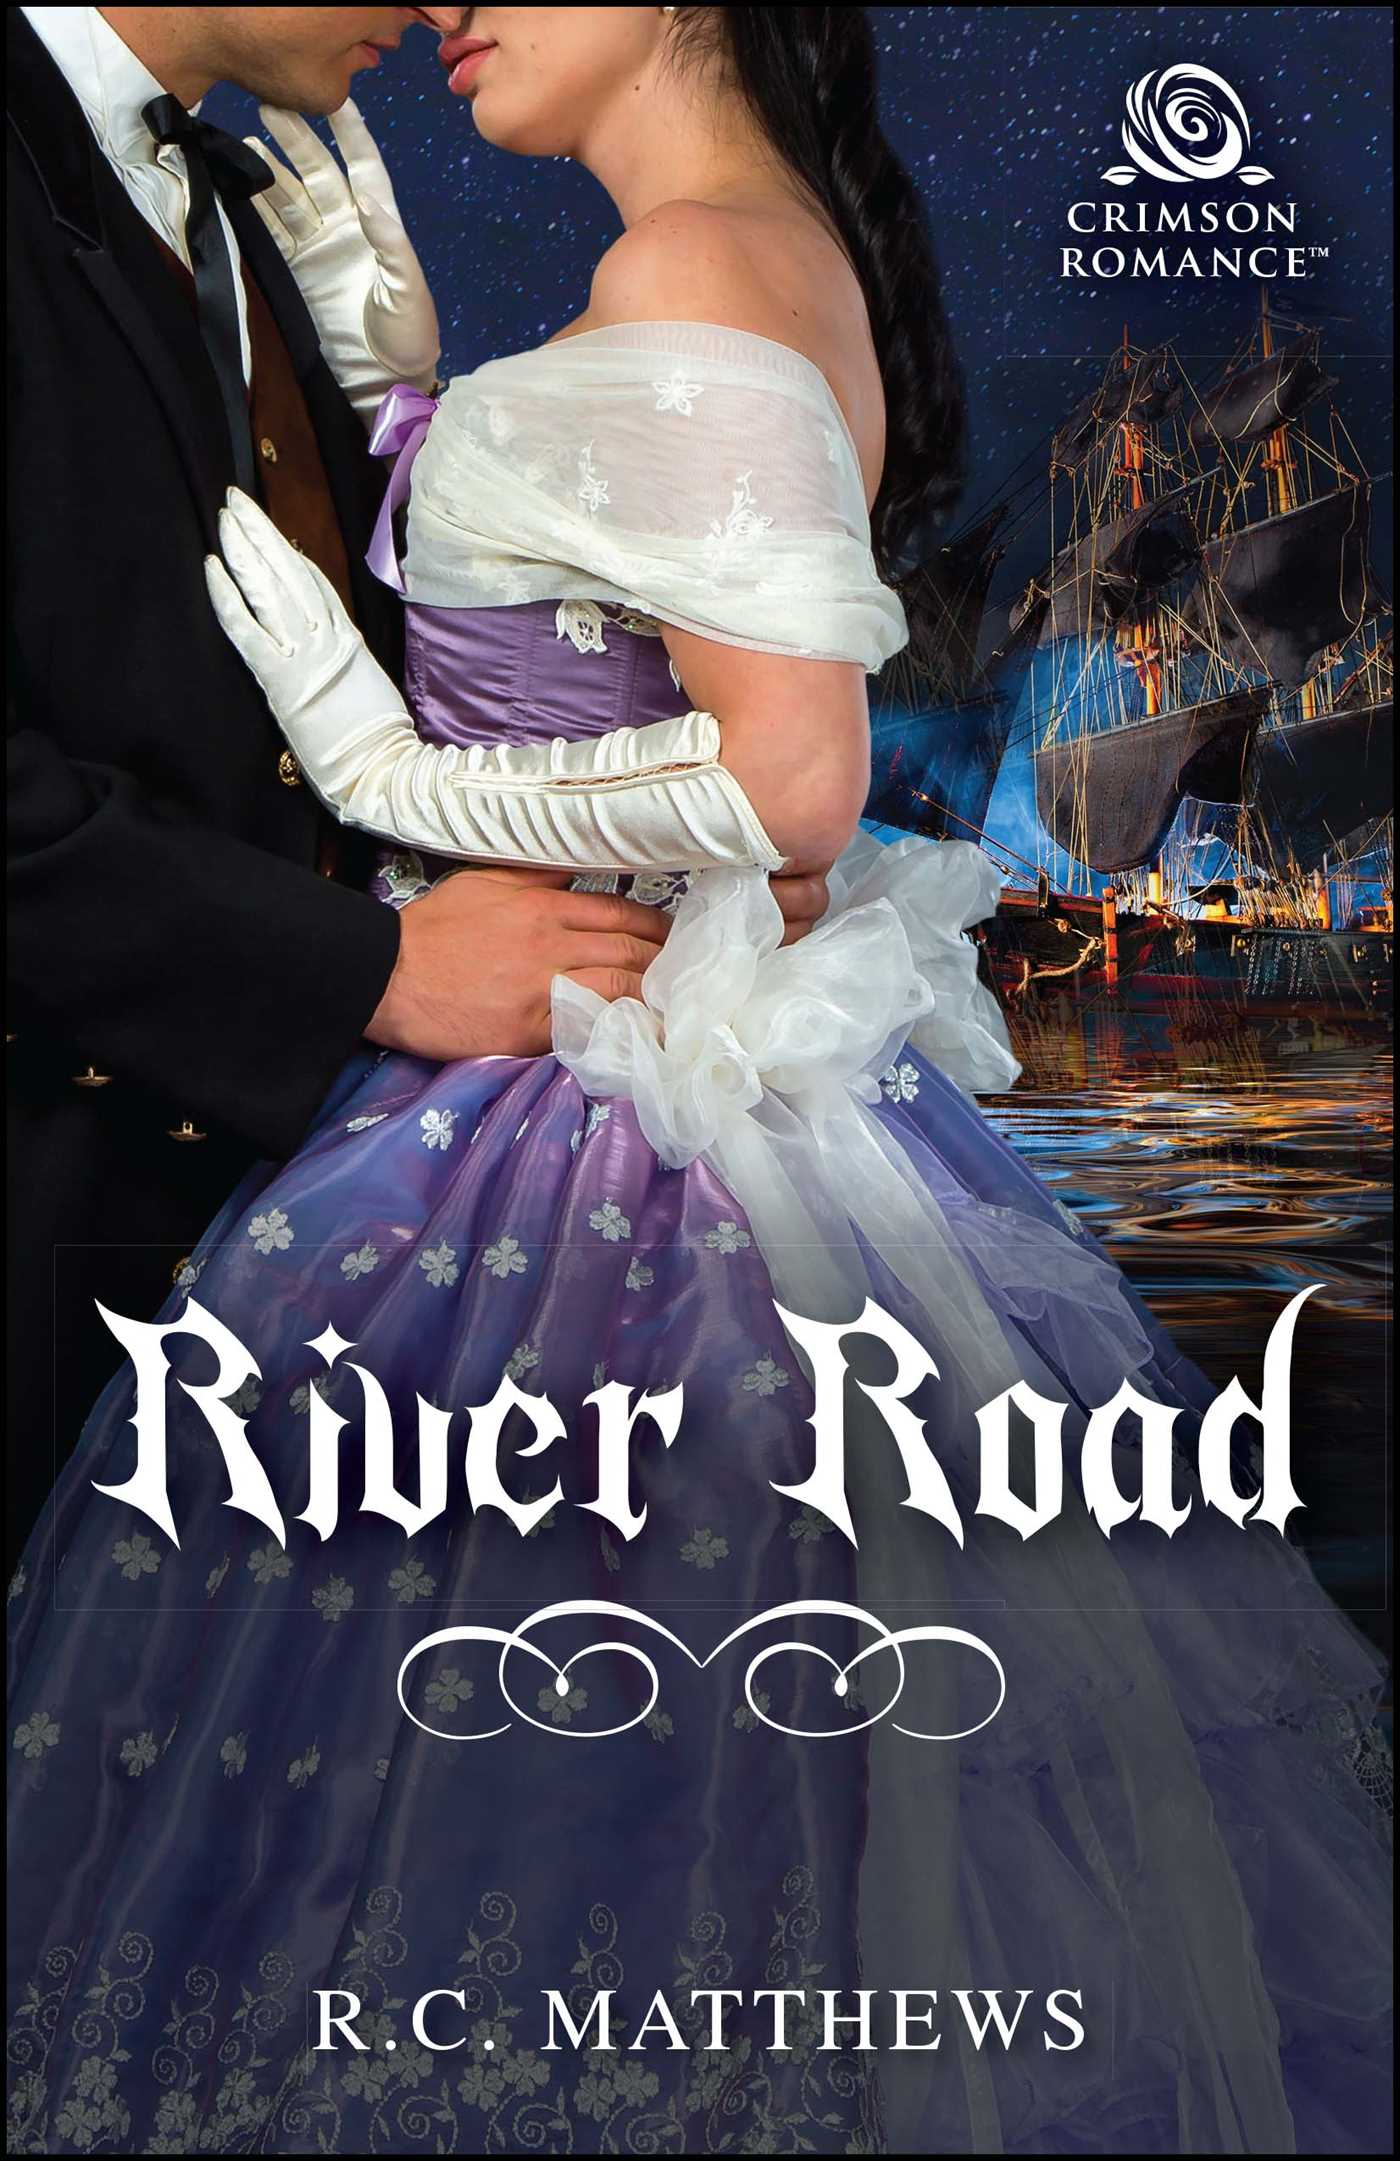 River road 9781507208069 hr